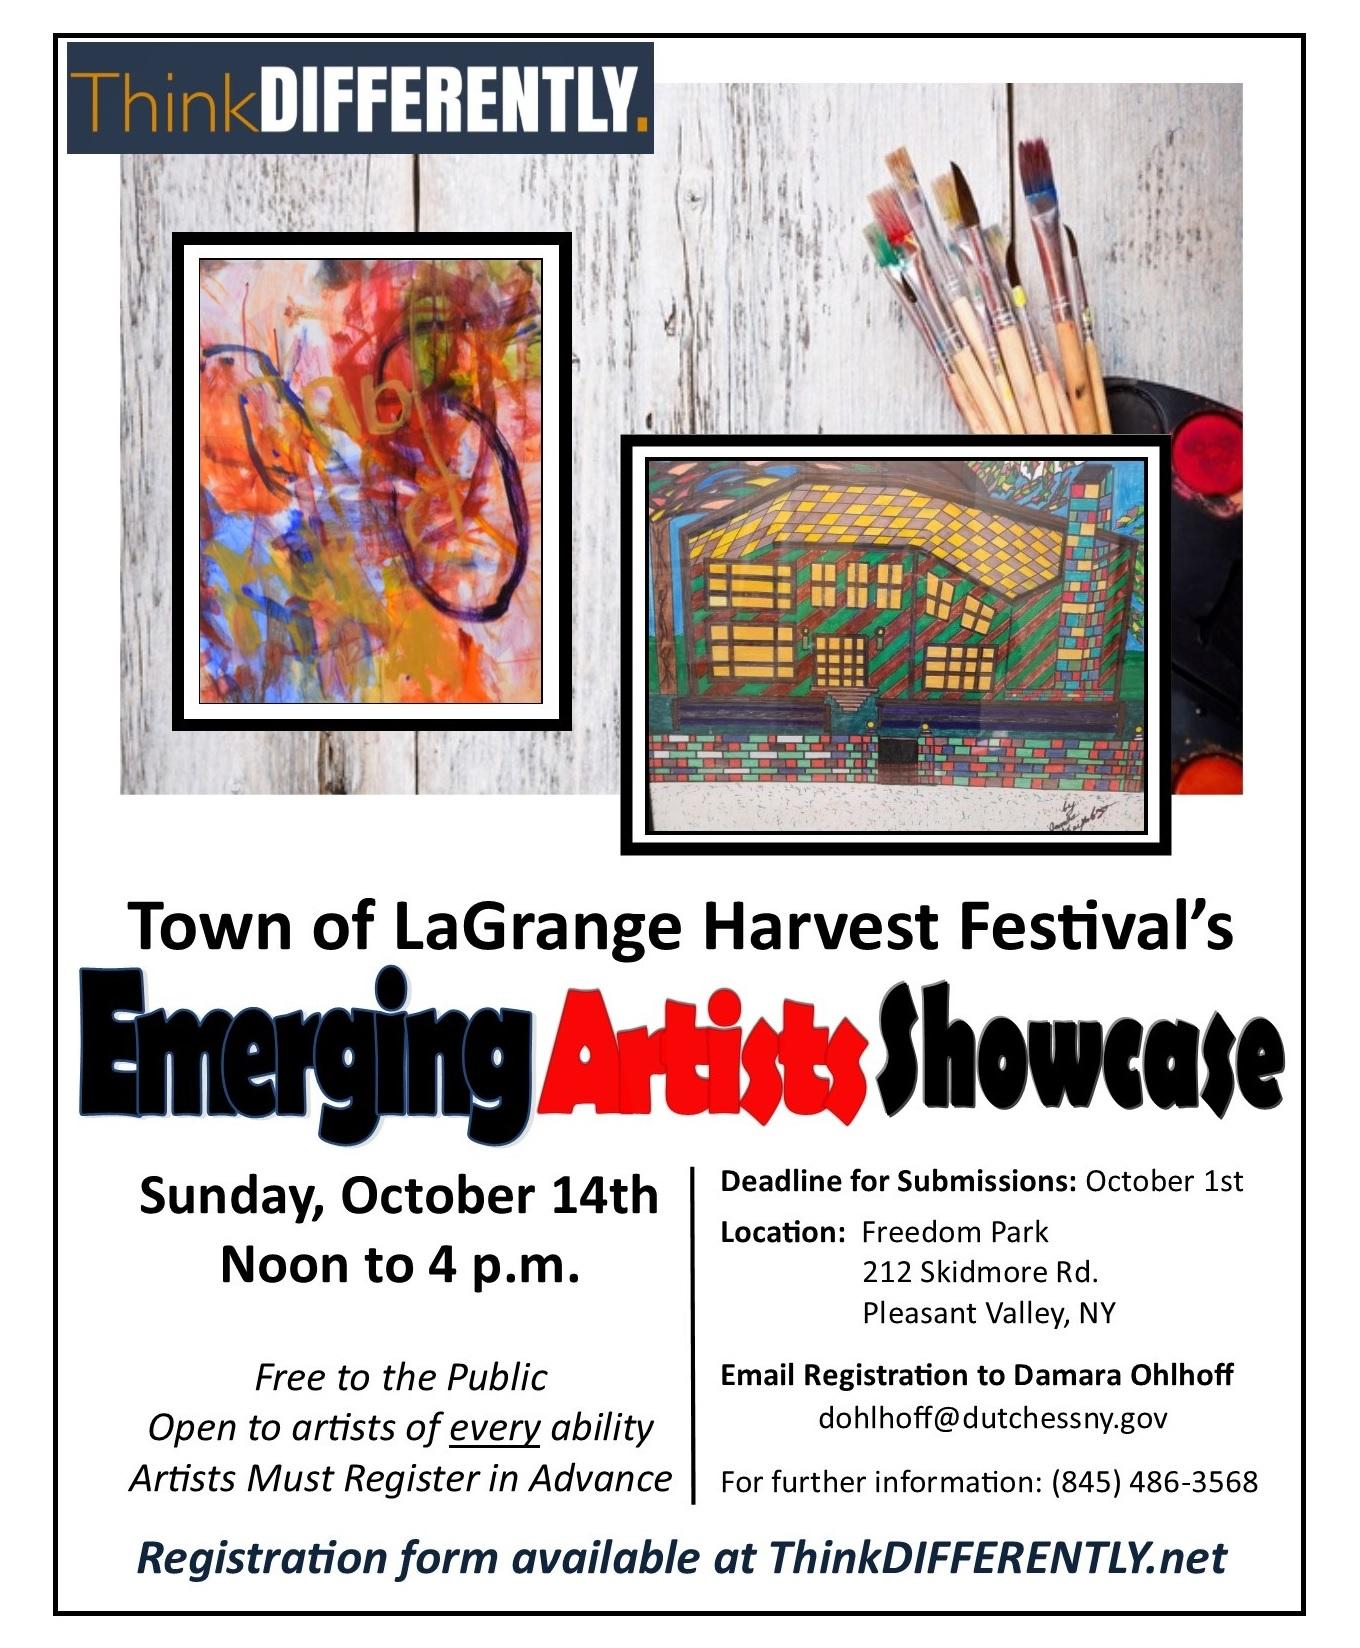 Emerging Artists Showcase invitation